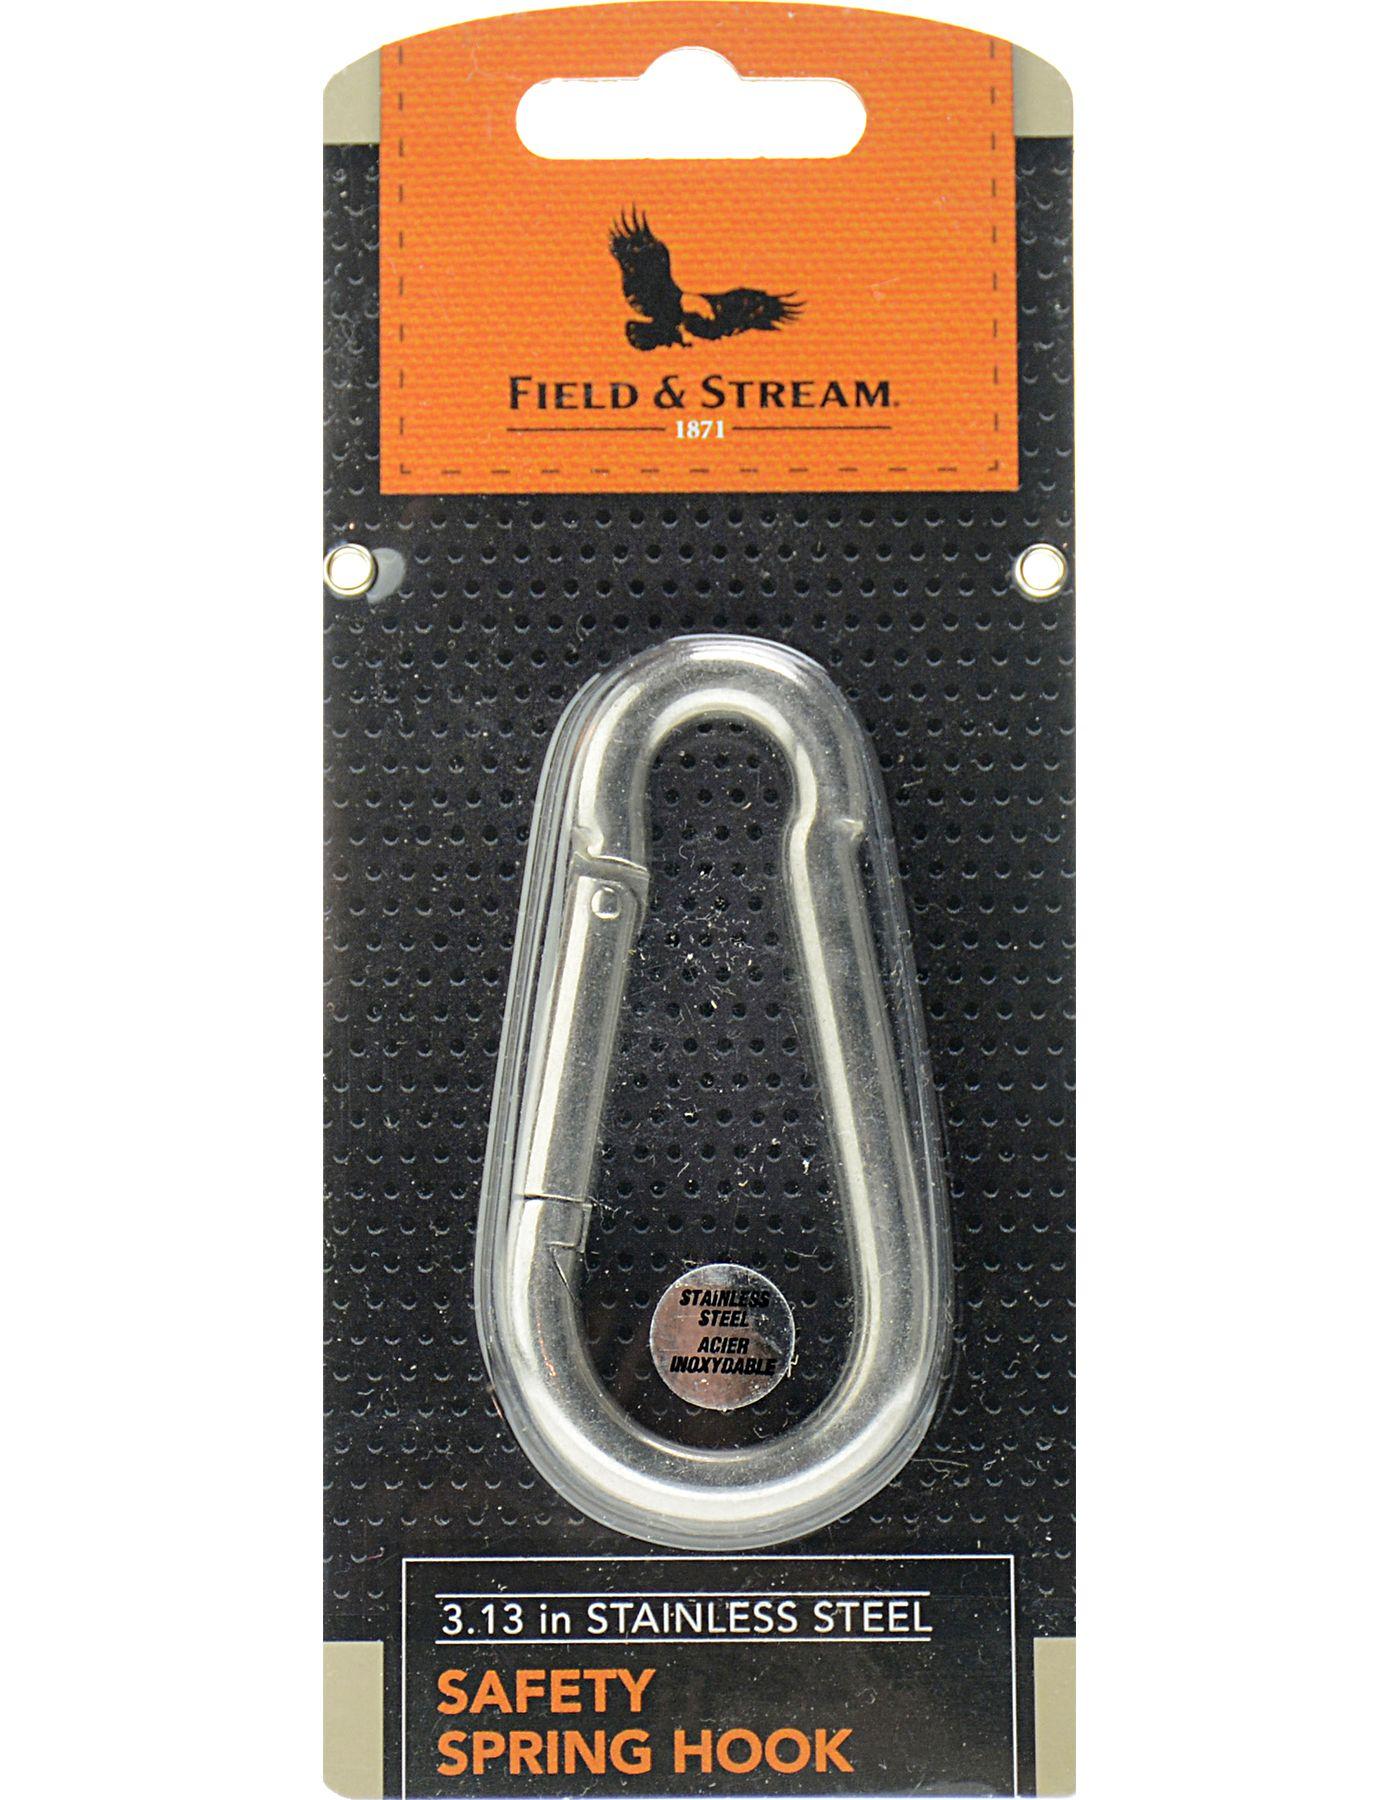 Field & Stream Safety Spring Hook